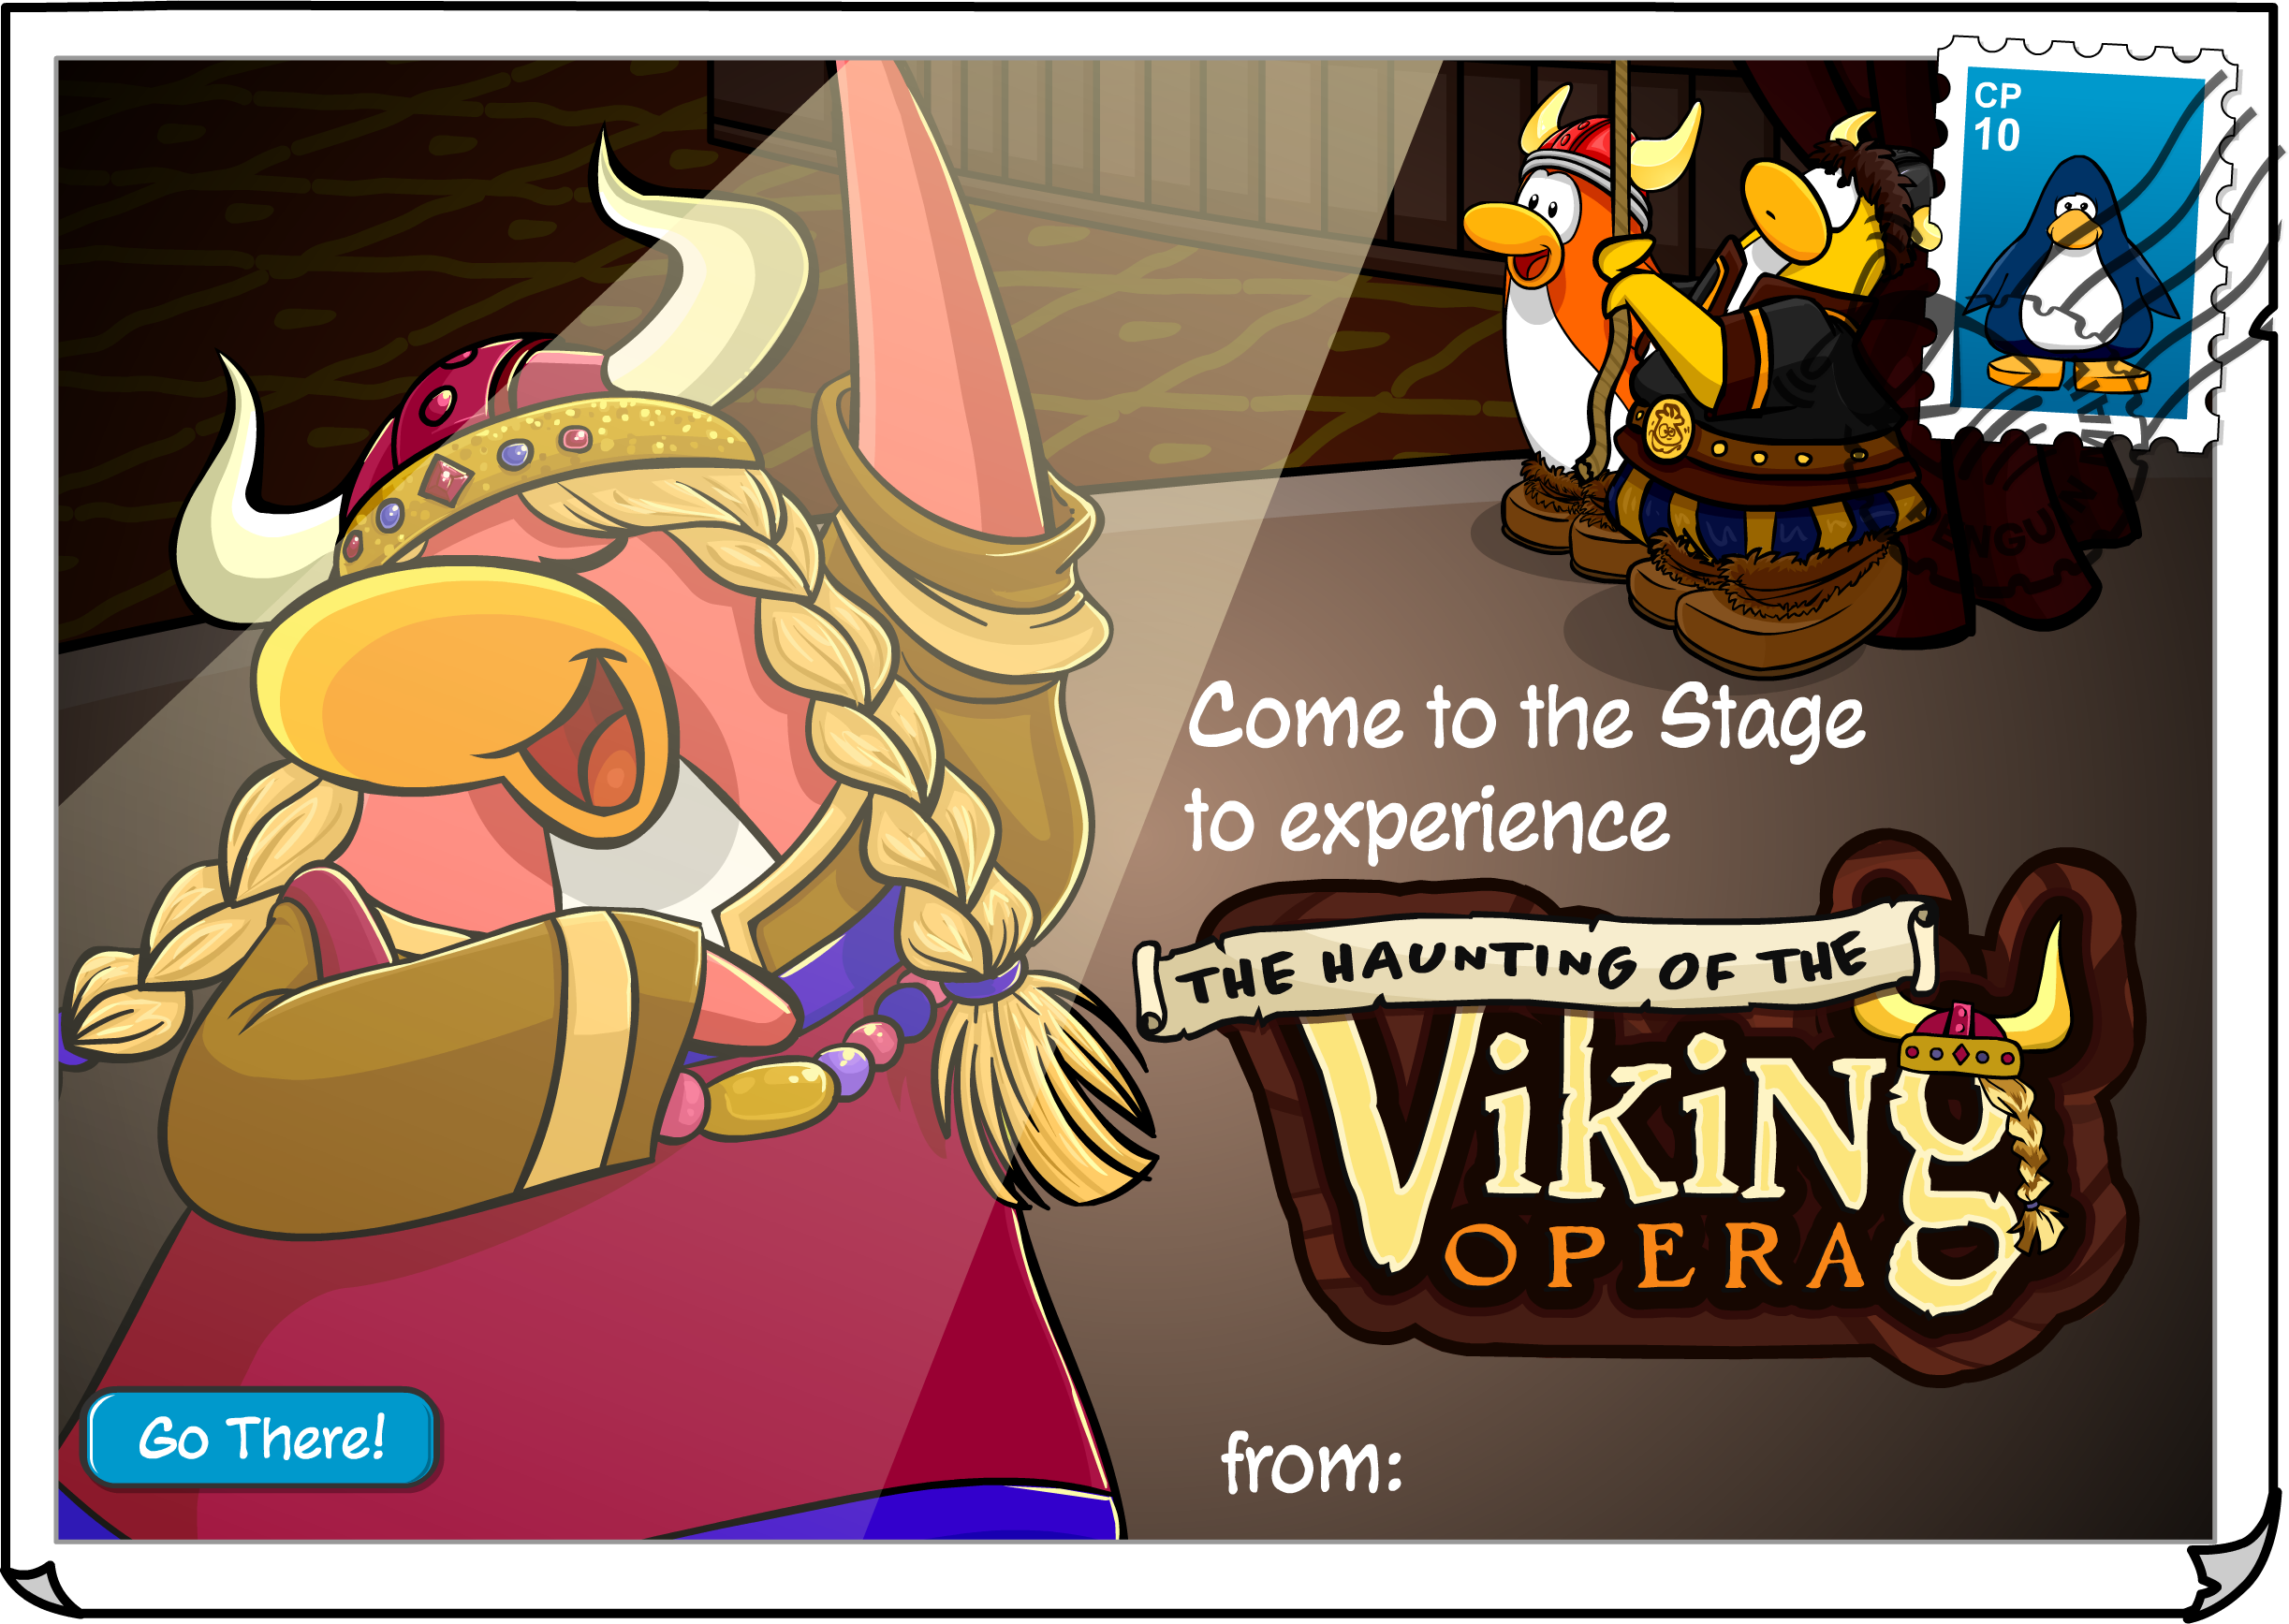 Haunting of the Viking Opera Postcard